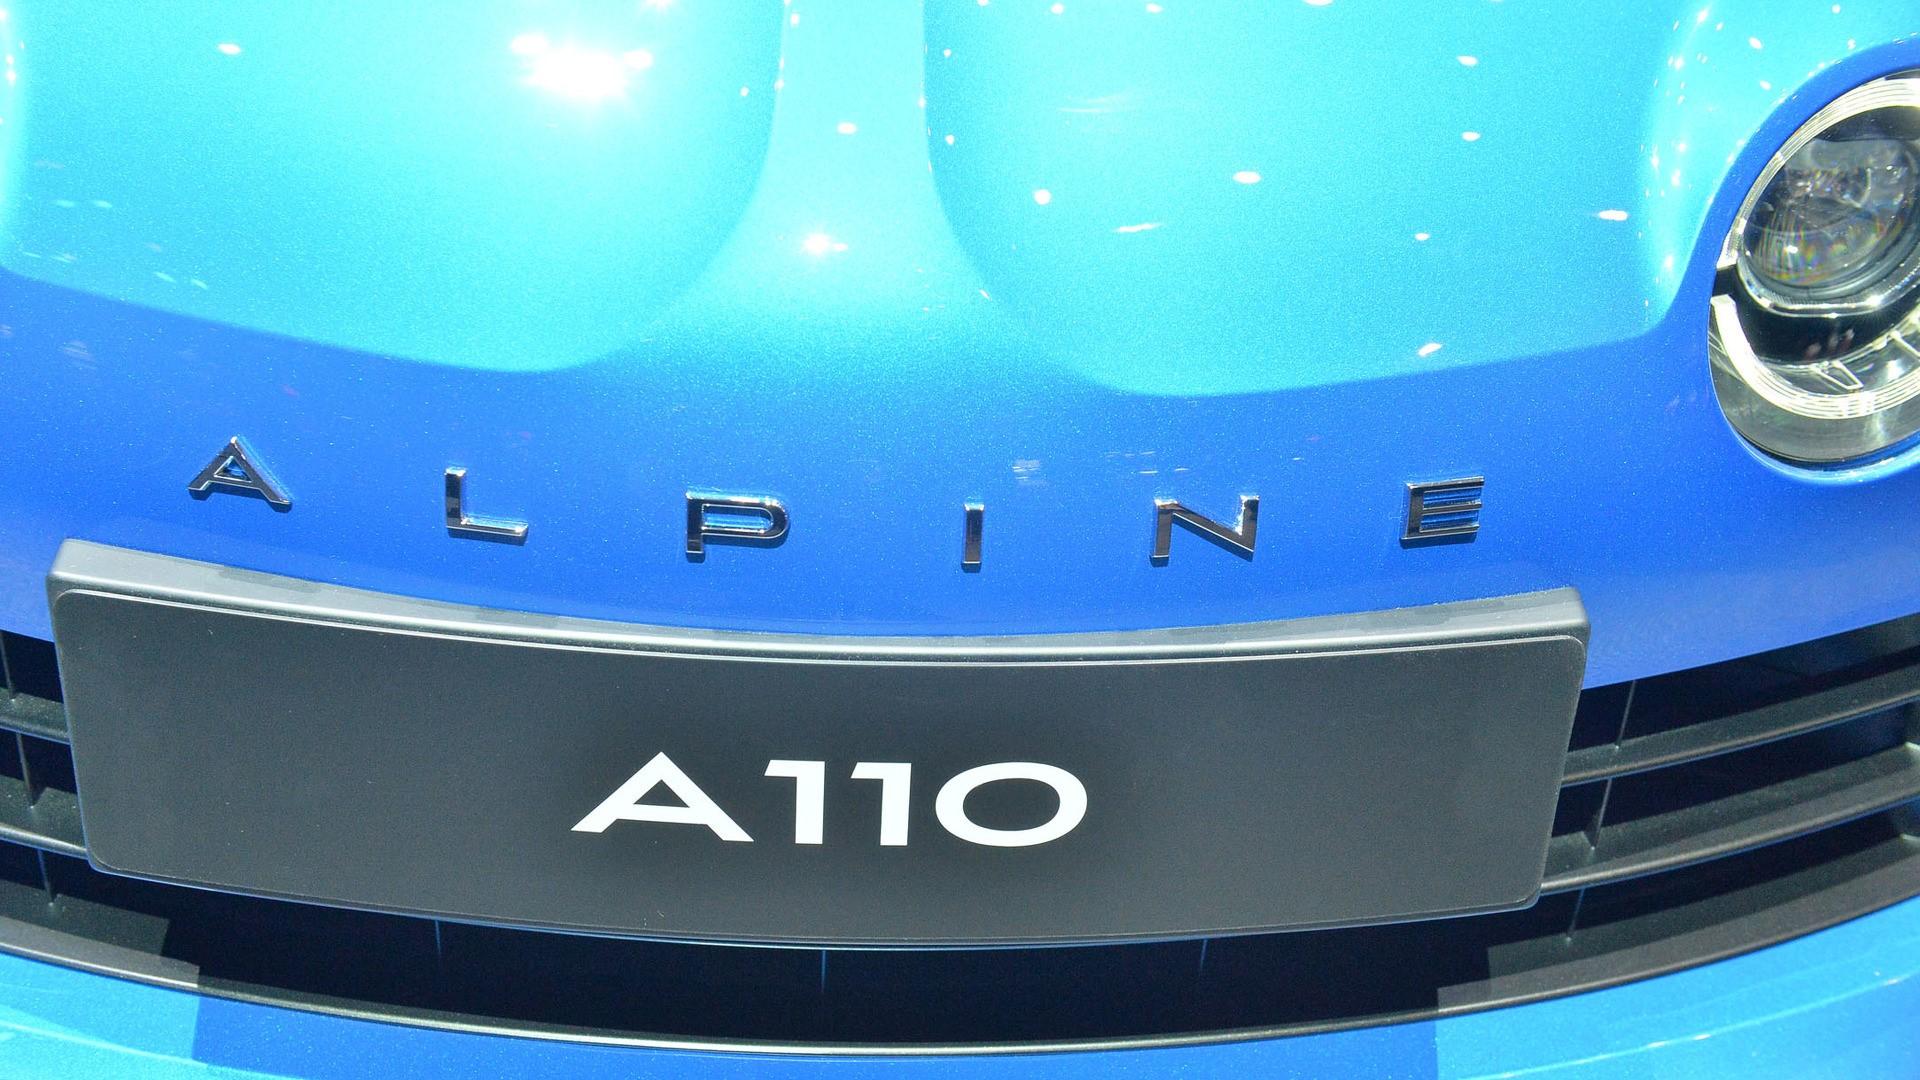 Alpine a110 (11)